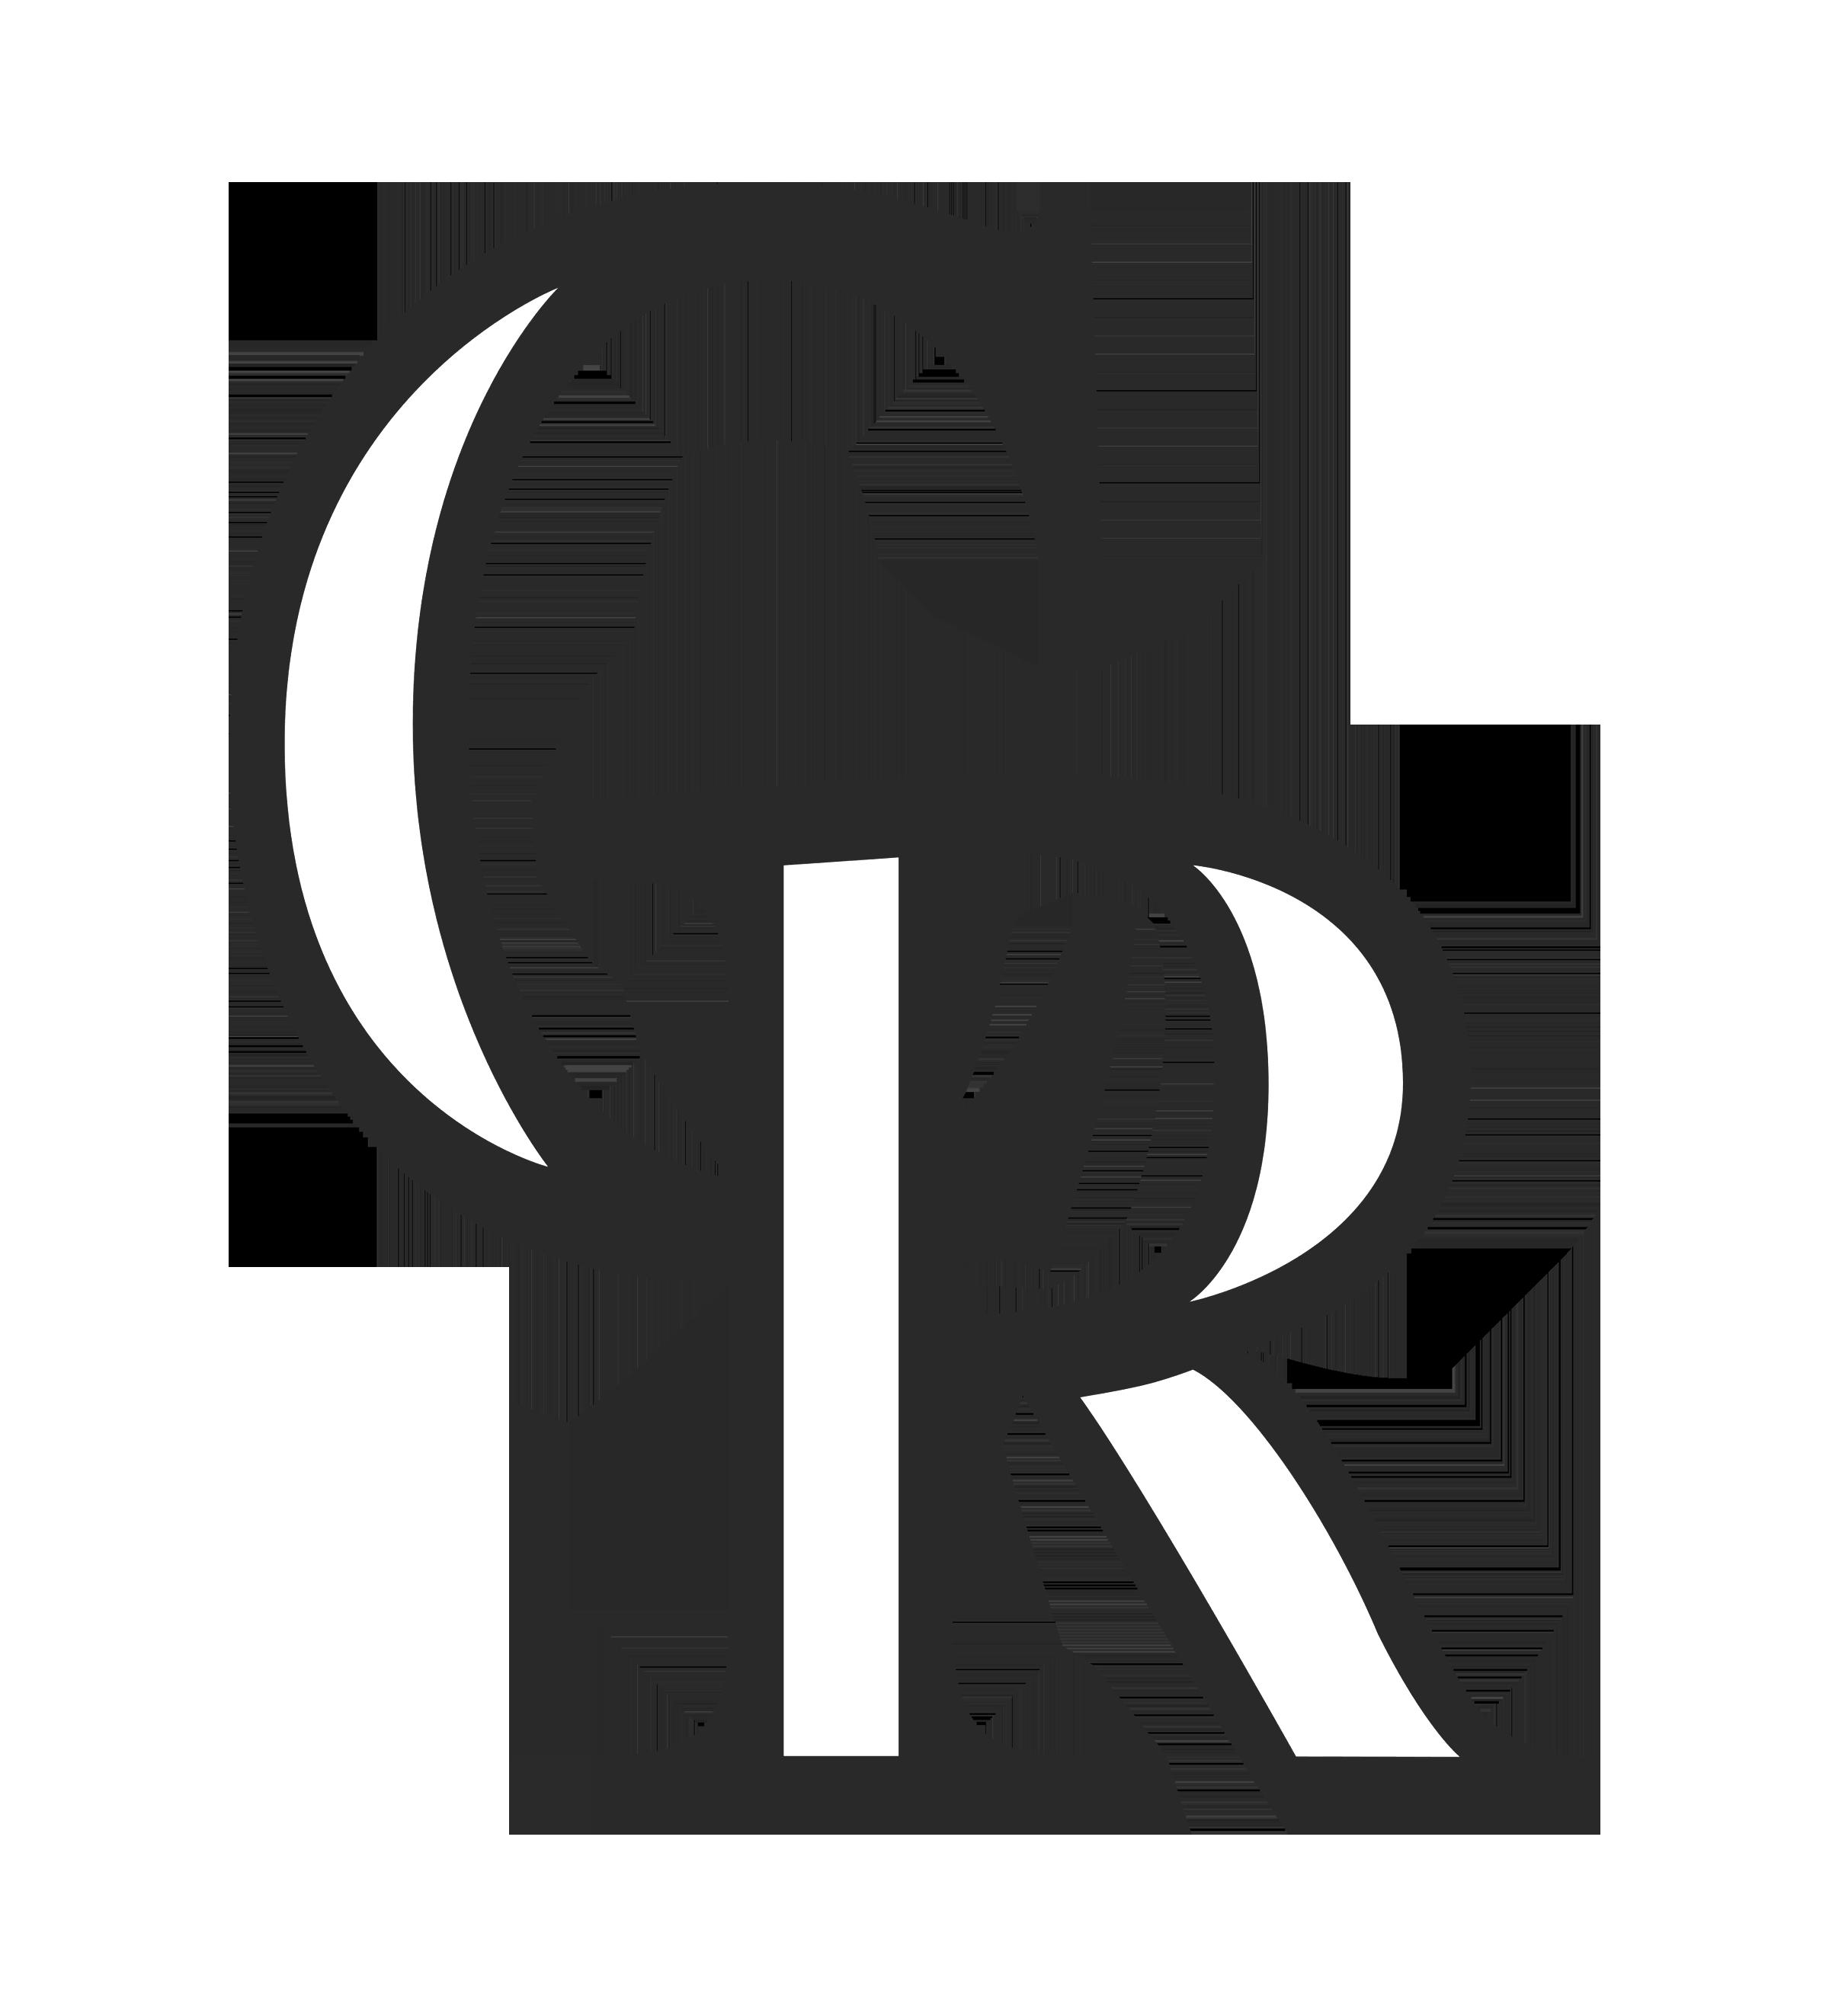 Rockies Logo Black And White Https Ift Tt 2n6q5n6 Colorado Rockies Rocky Black And White